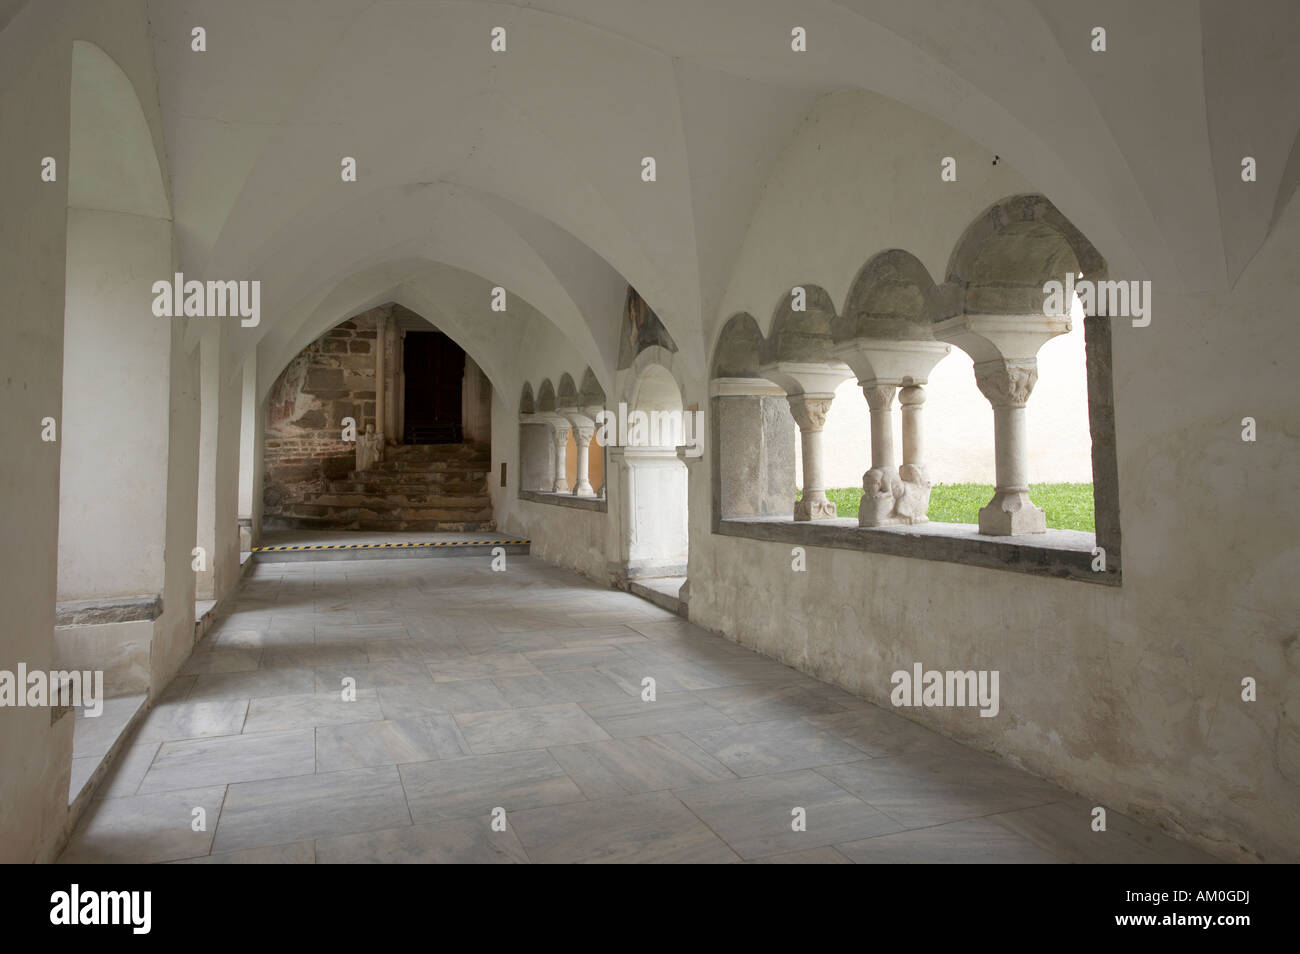 Cloister, Millstatt monastery, Carinthia, Austria - Stock Image